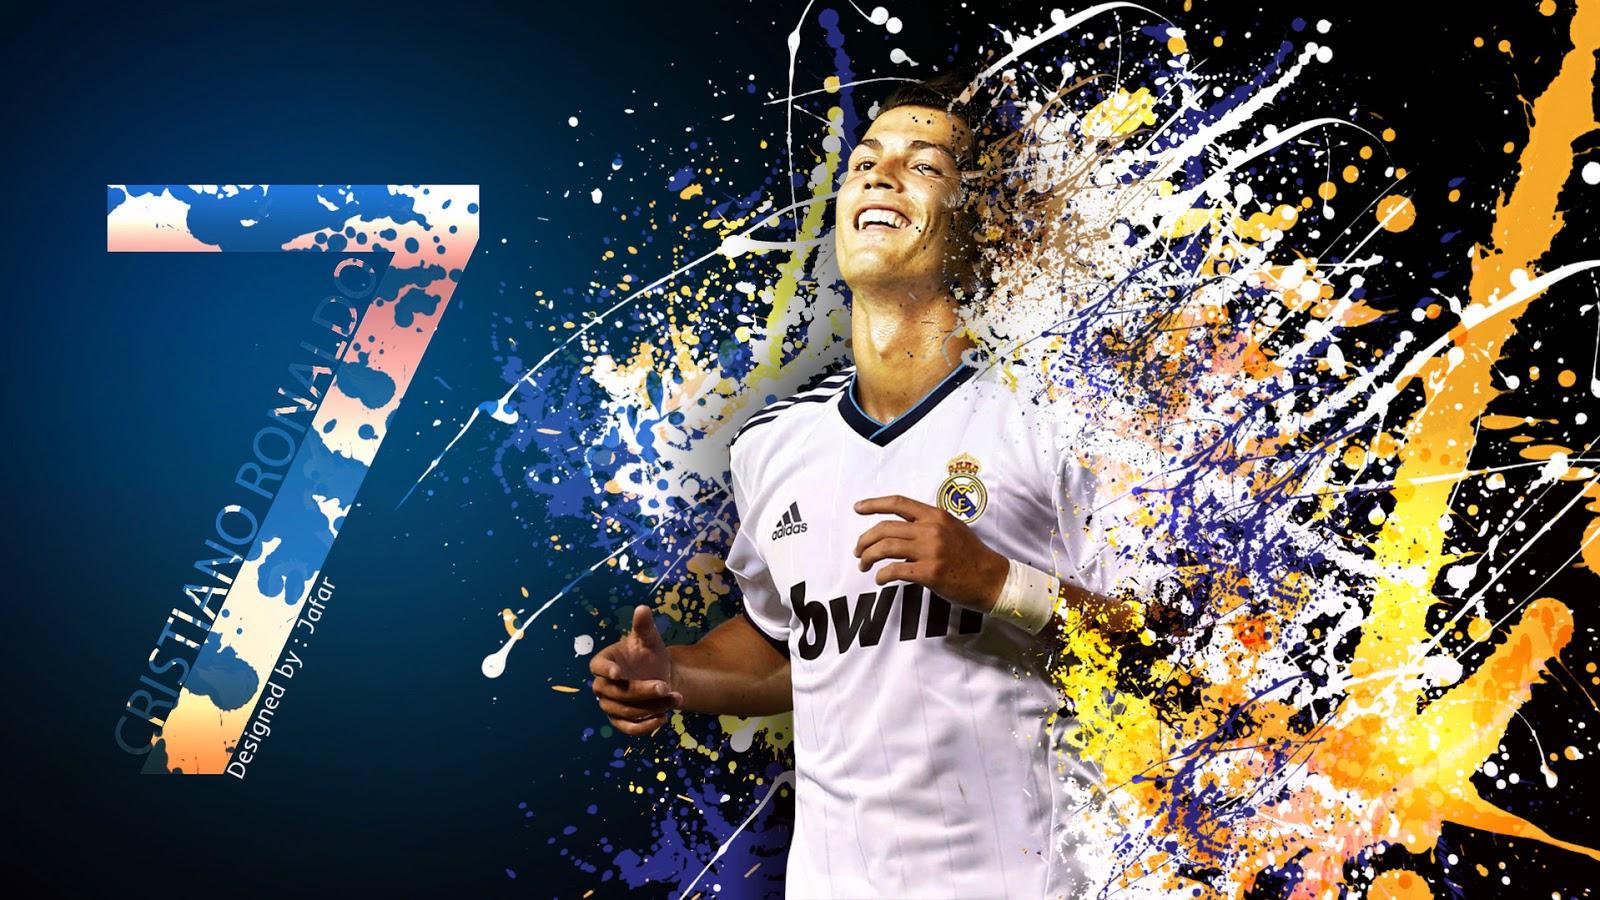 Cristiano Ronaldo 2013 Wallpapers HD